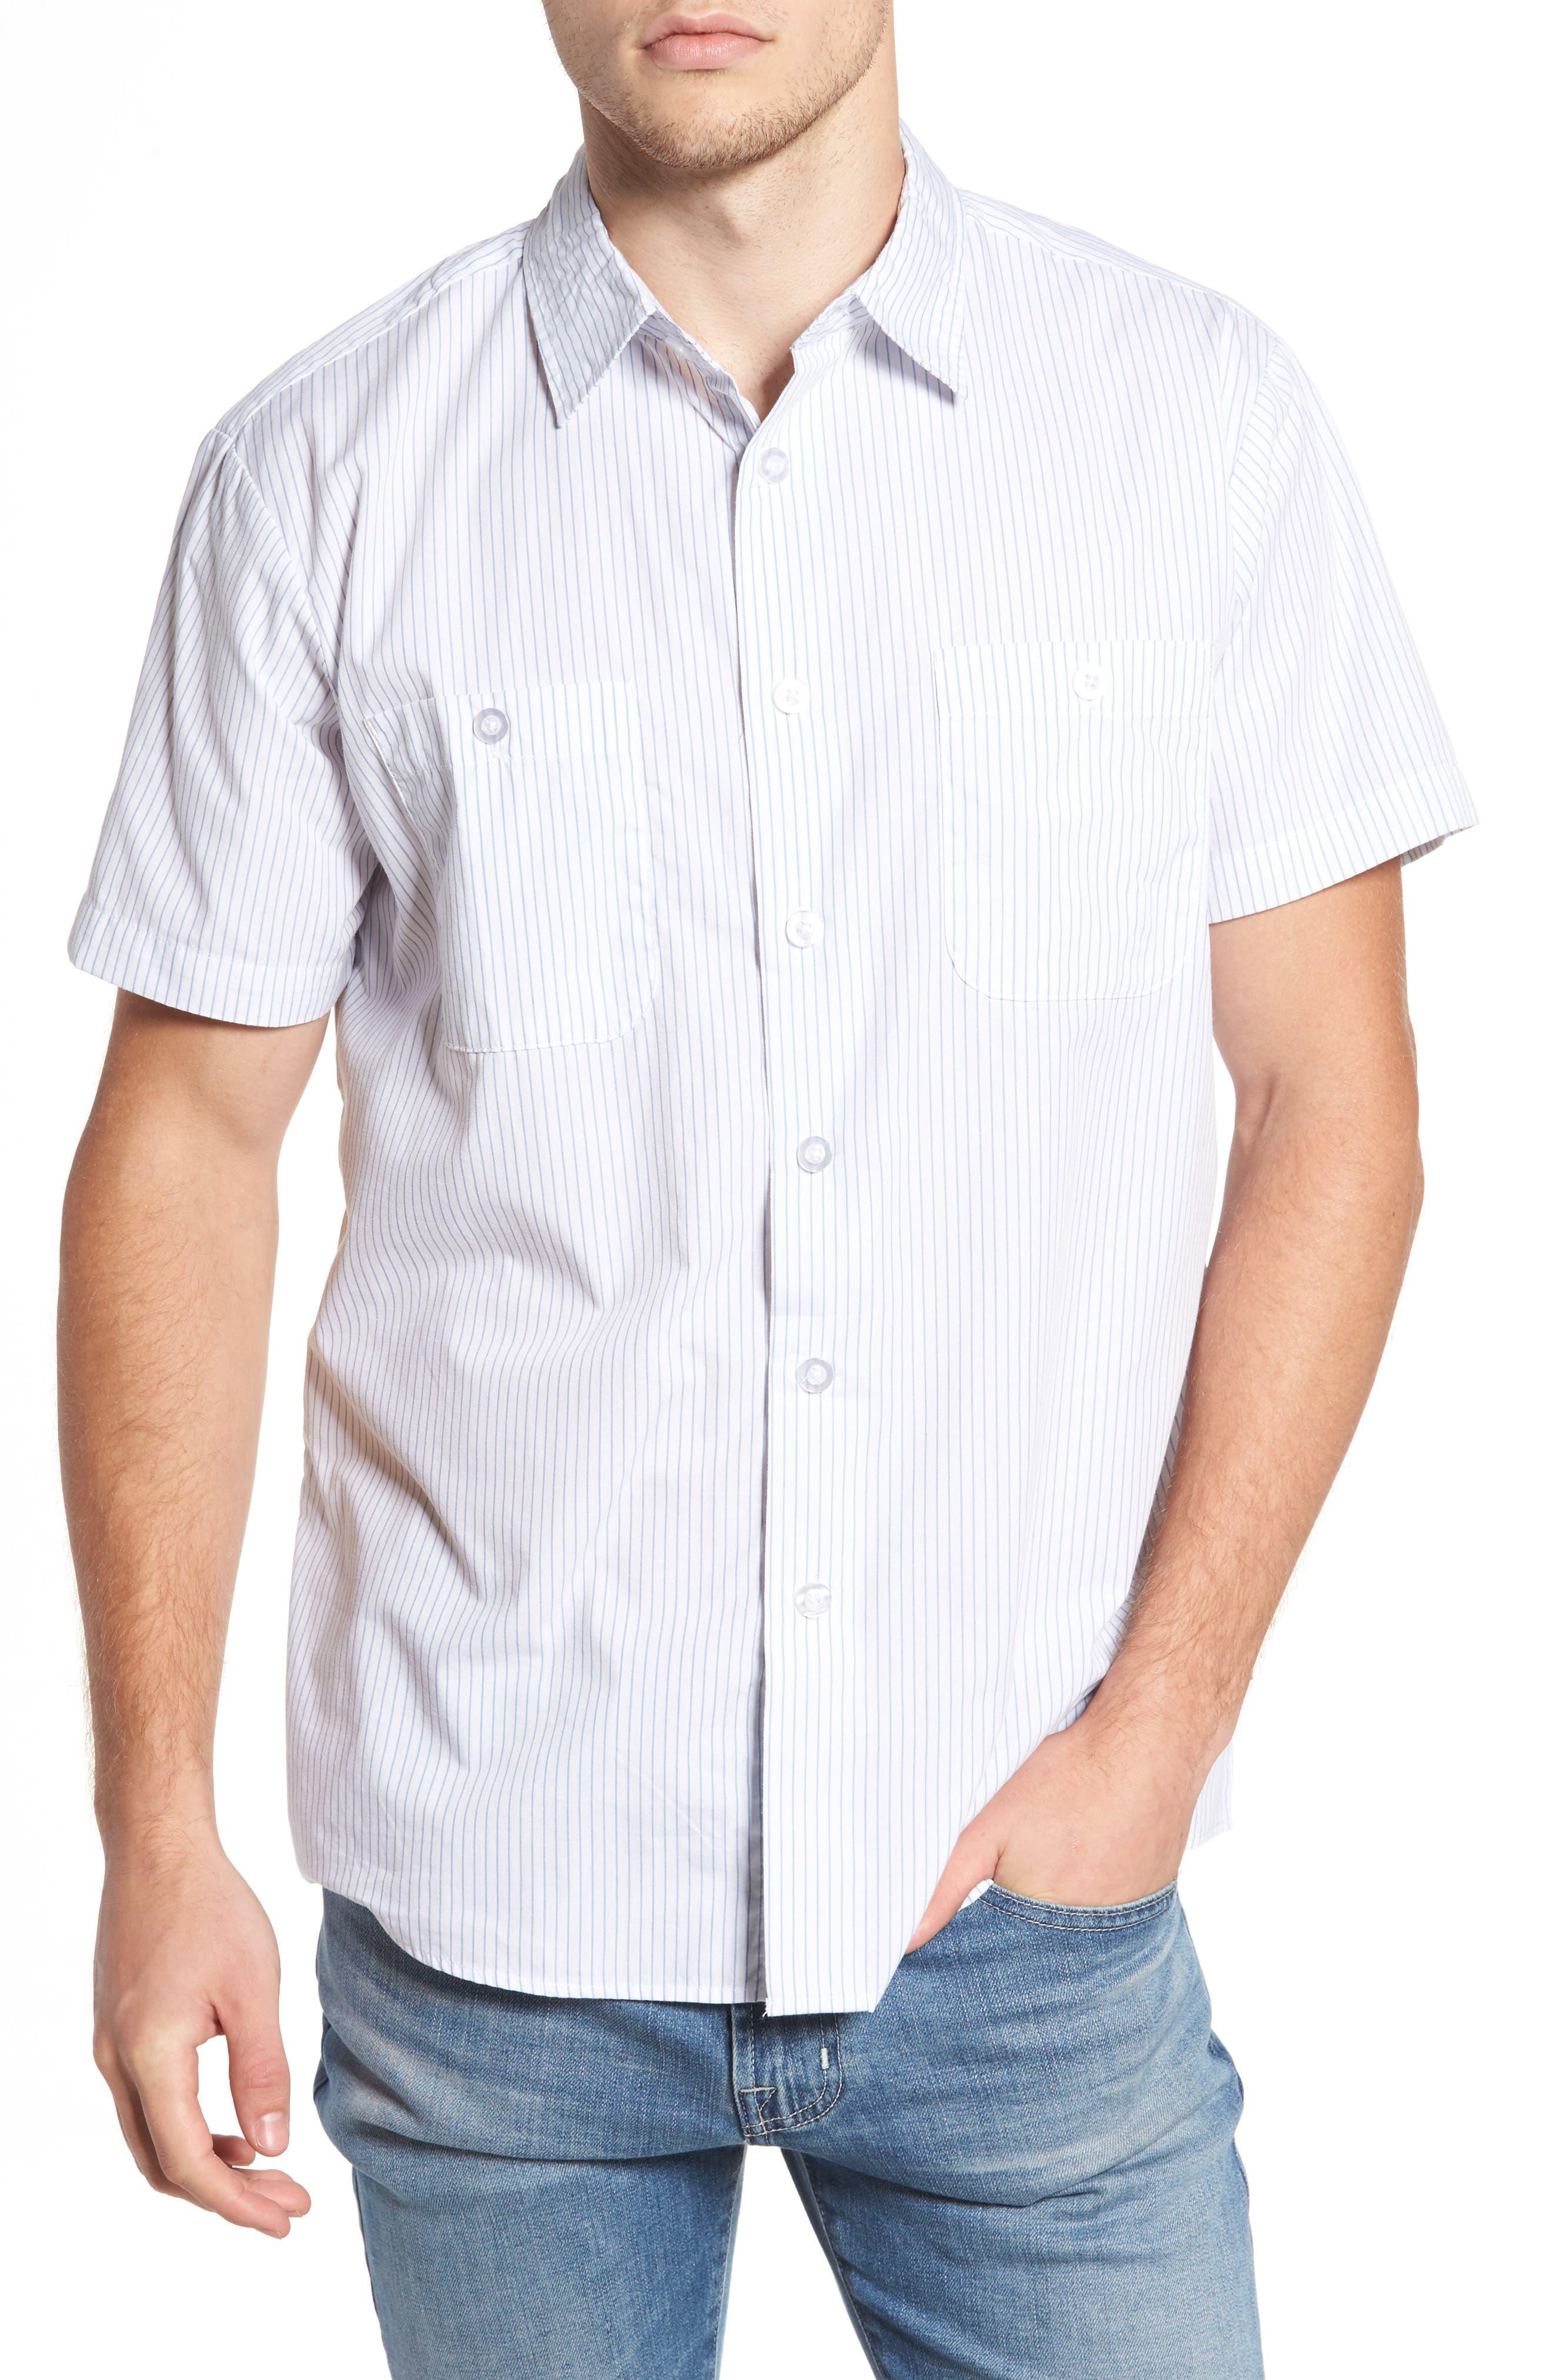 Brixton Reeve Pinstripe Woven Shirt